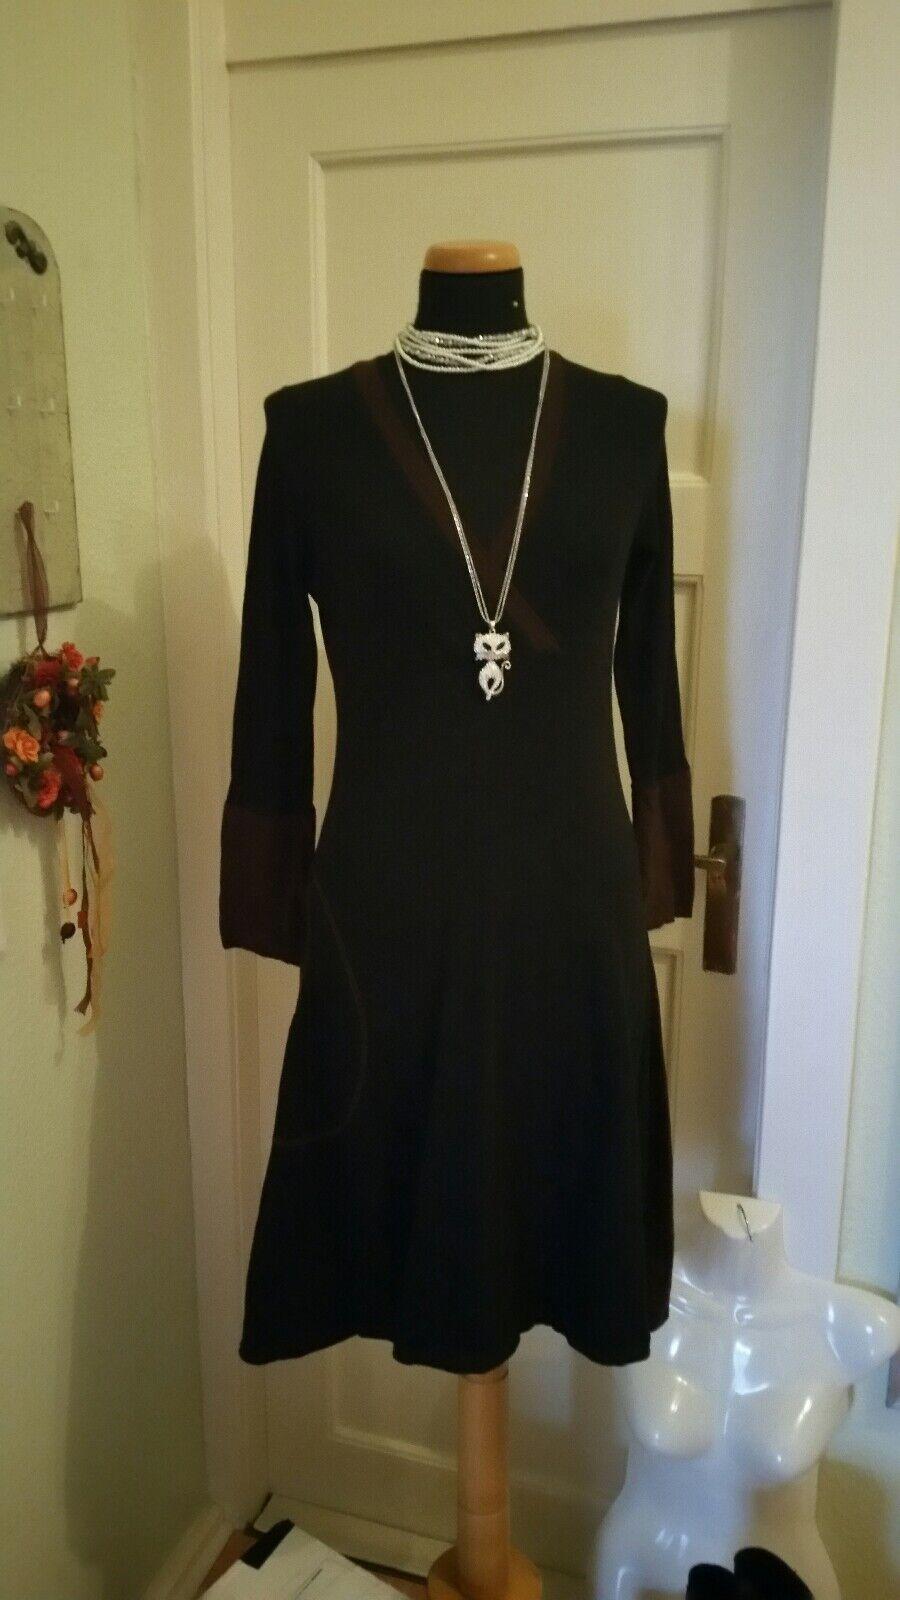 Skandinavische Mode Design Se Min Min Min Kjole Kleid Gr.M L 029290